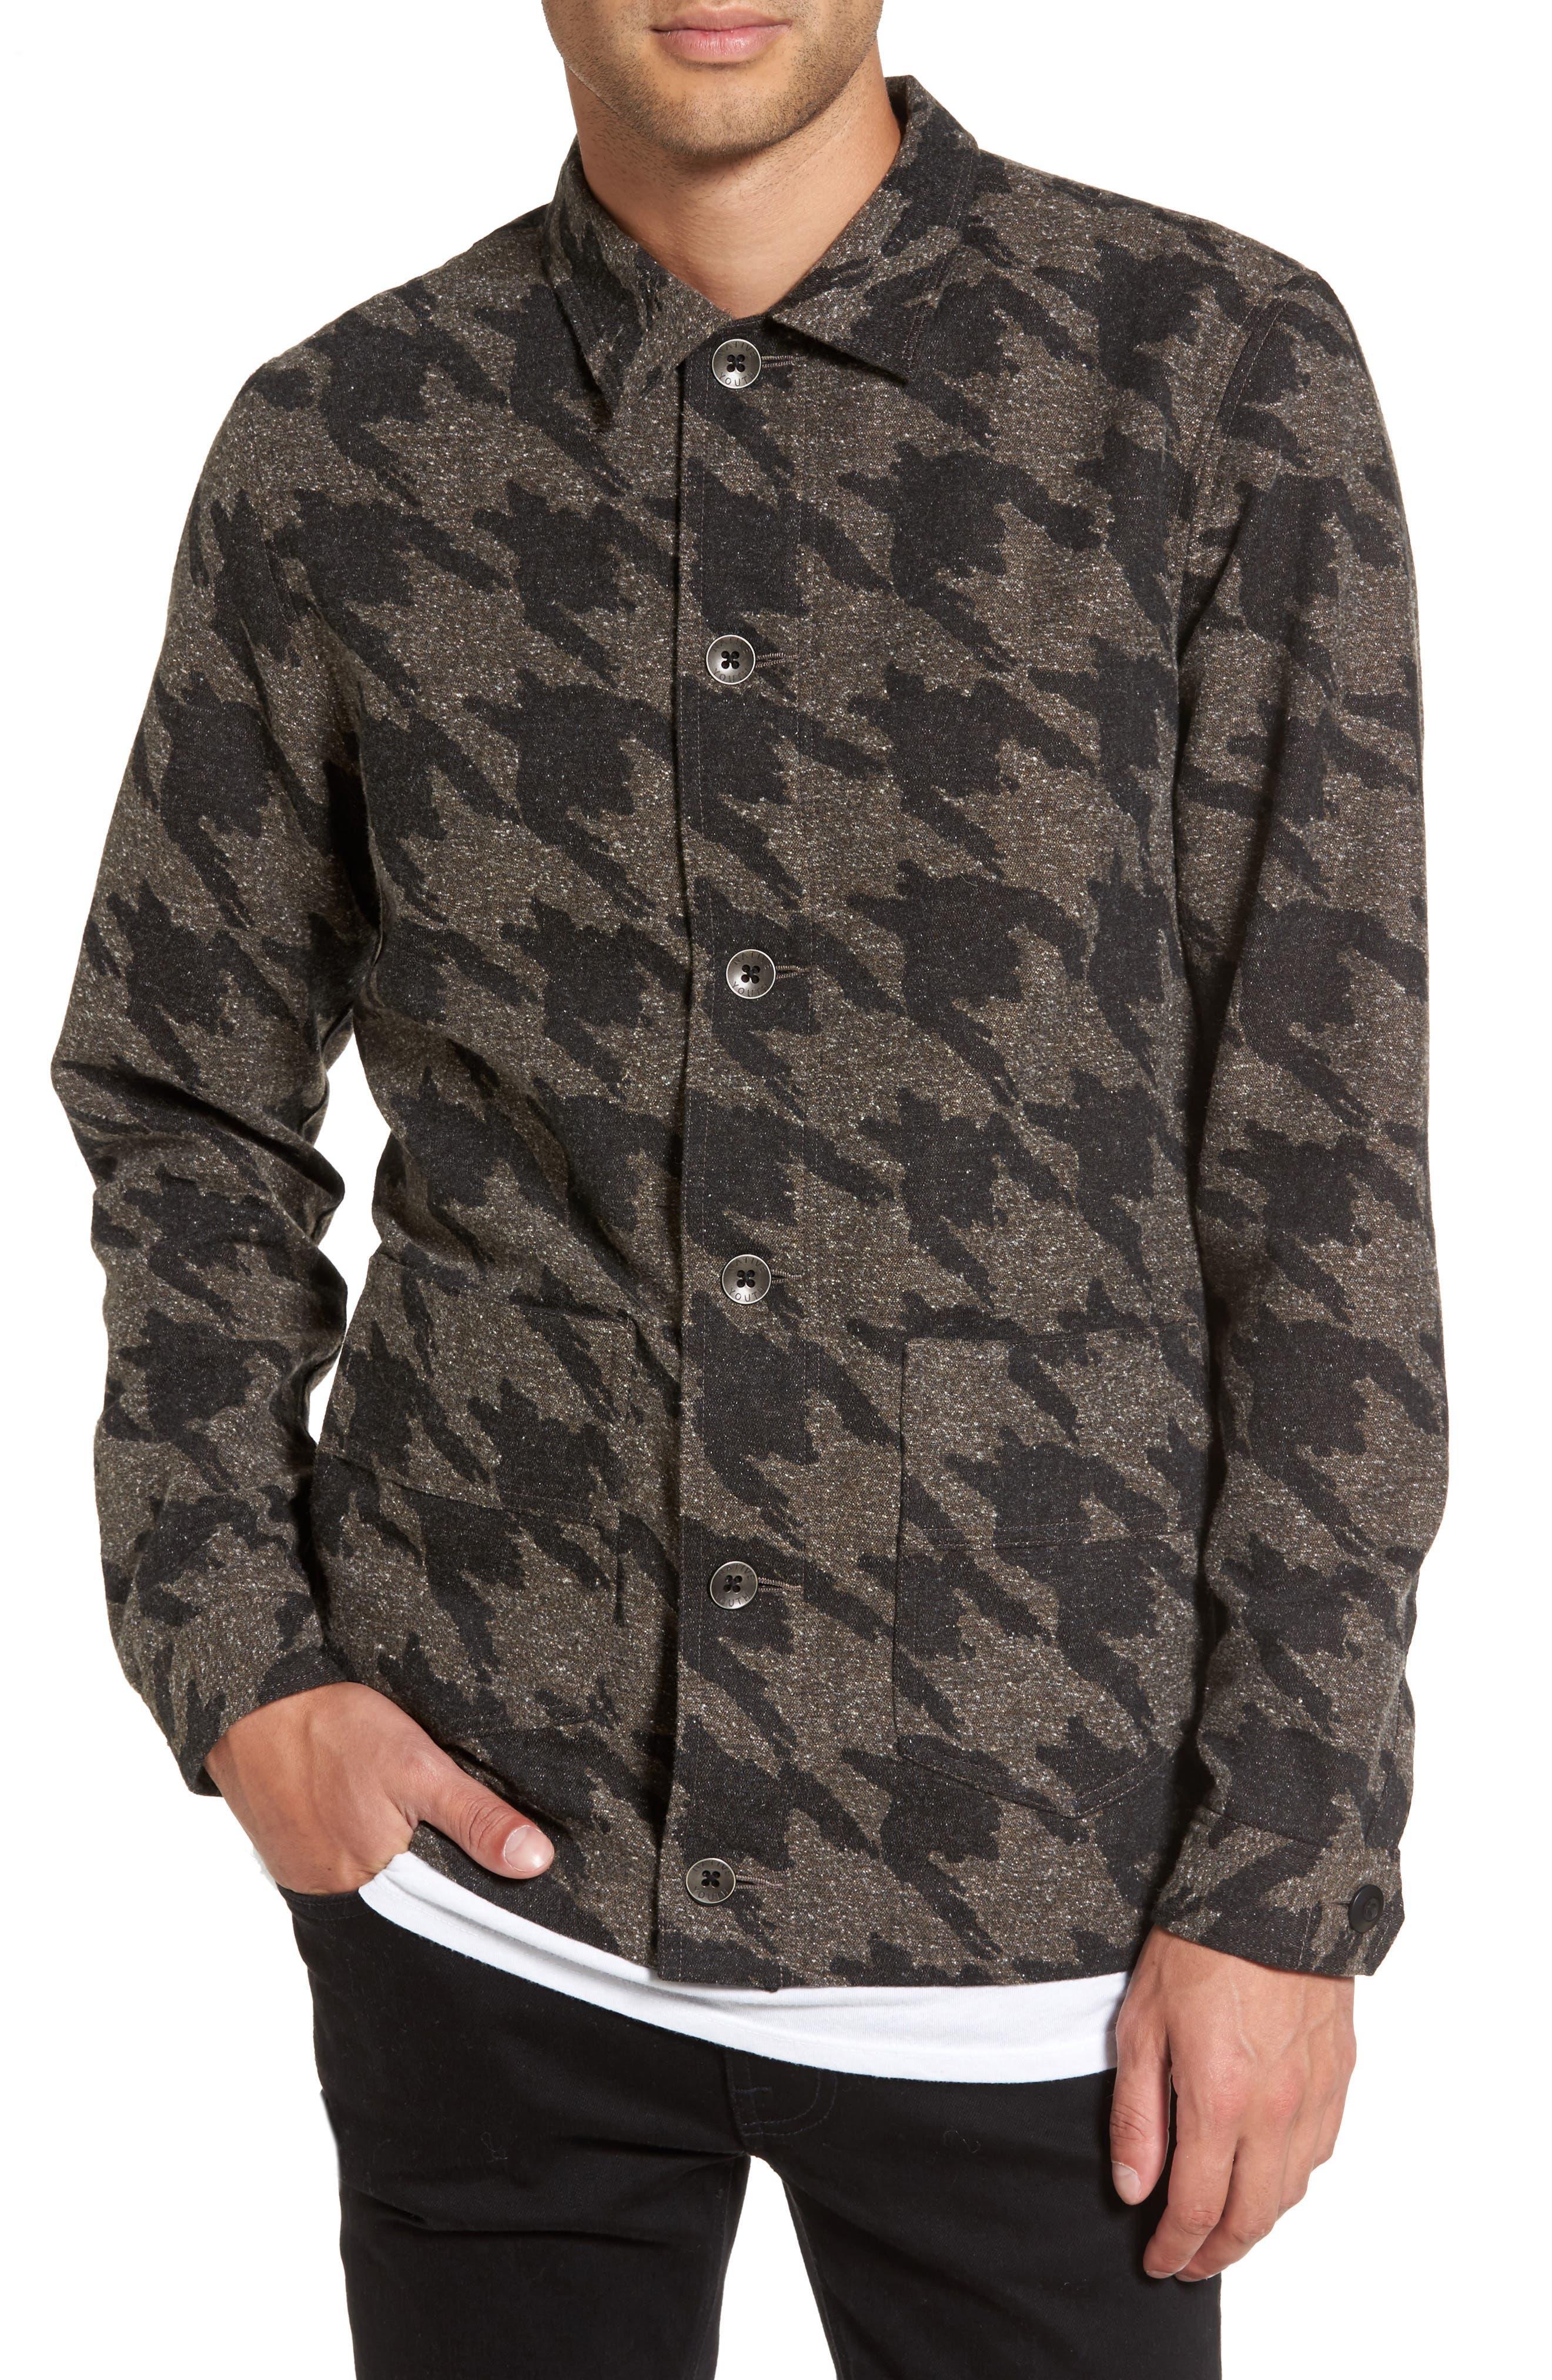 Lynx Shirt Jacket,                         Main,                         color, 023